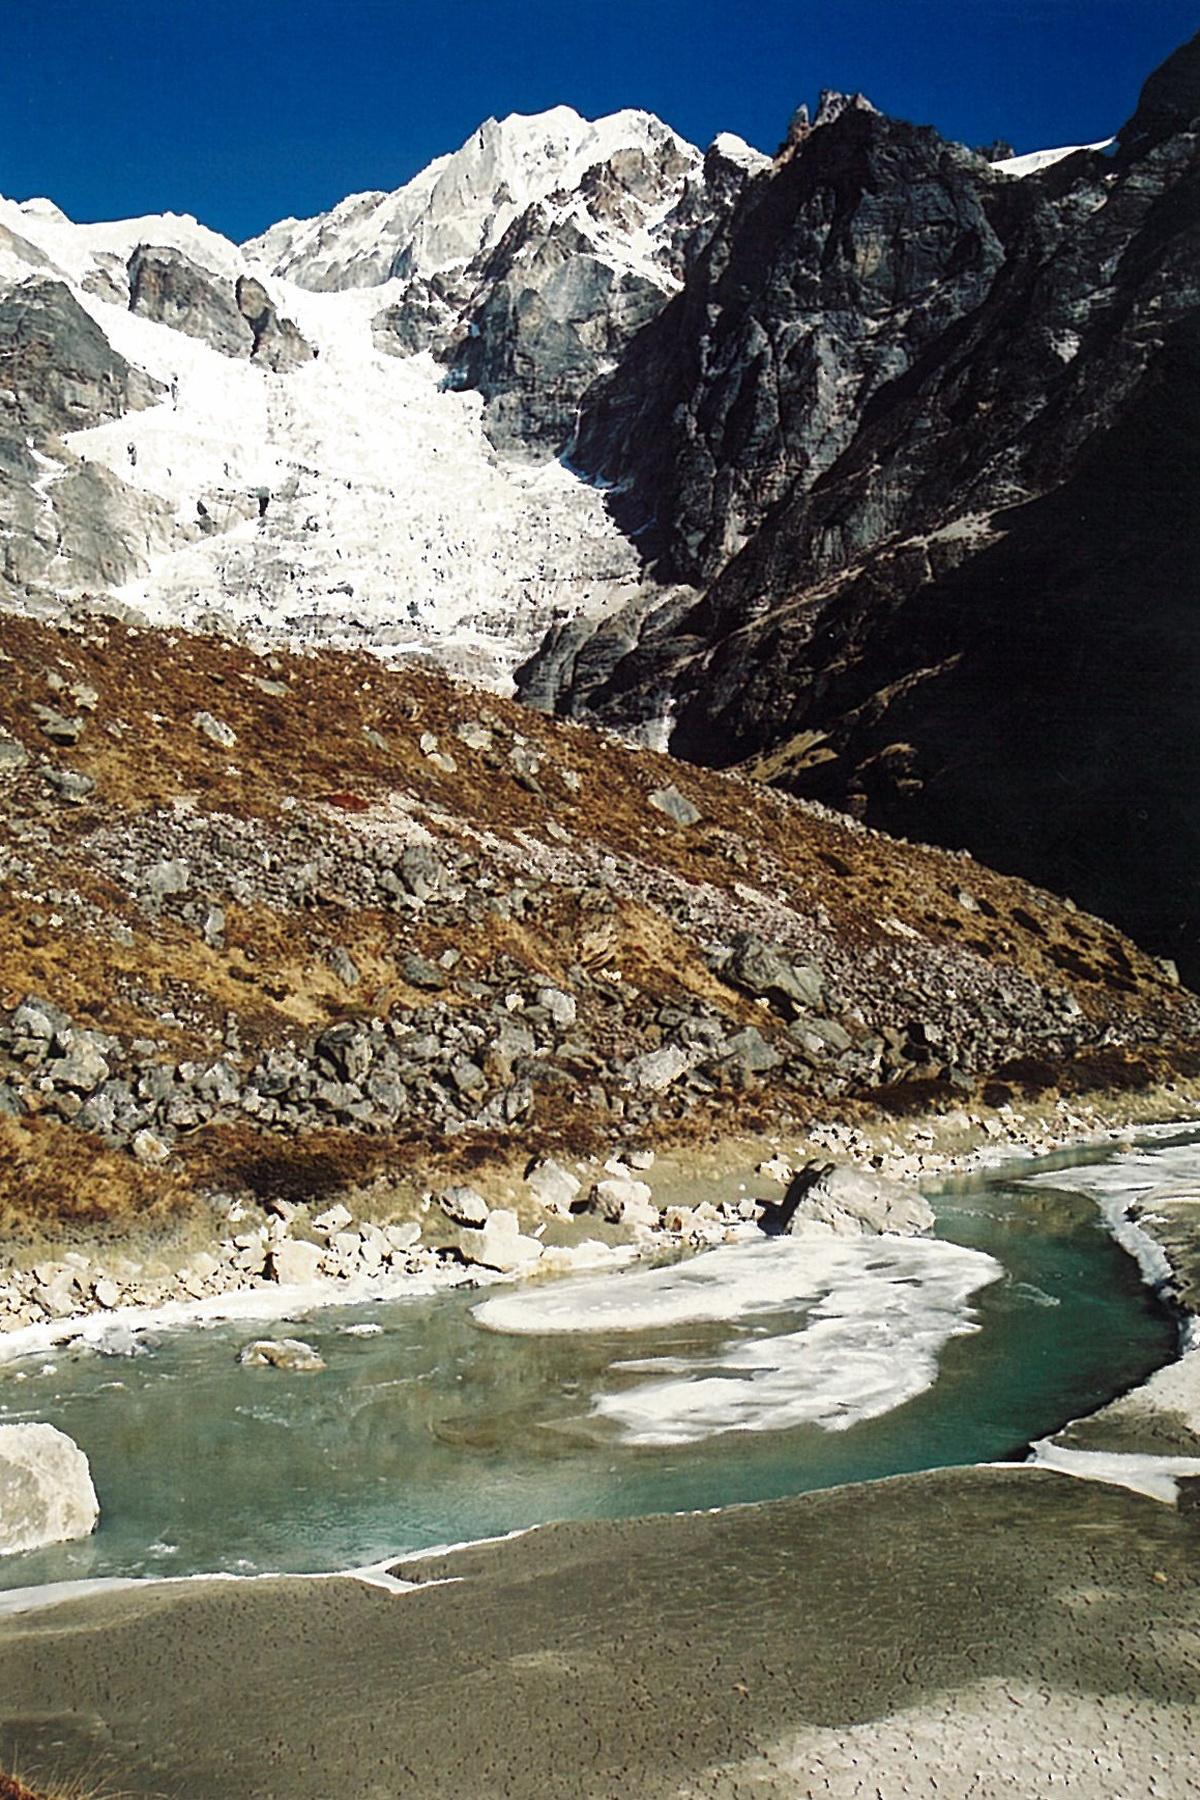 Glacial River Mera Trekking Peak Hinku Valley Trek Nepal Himalayas Hike Hiking